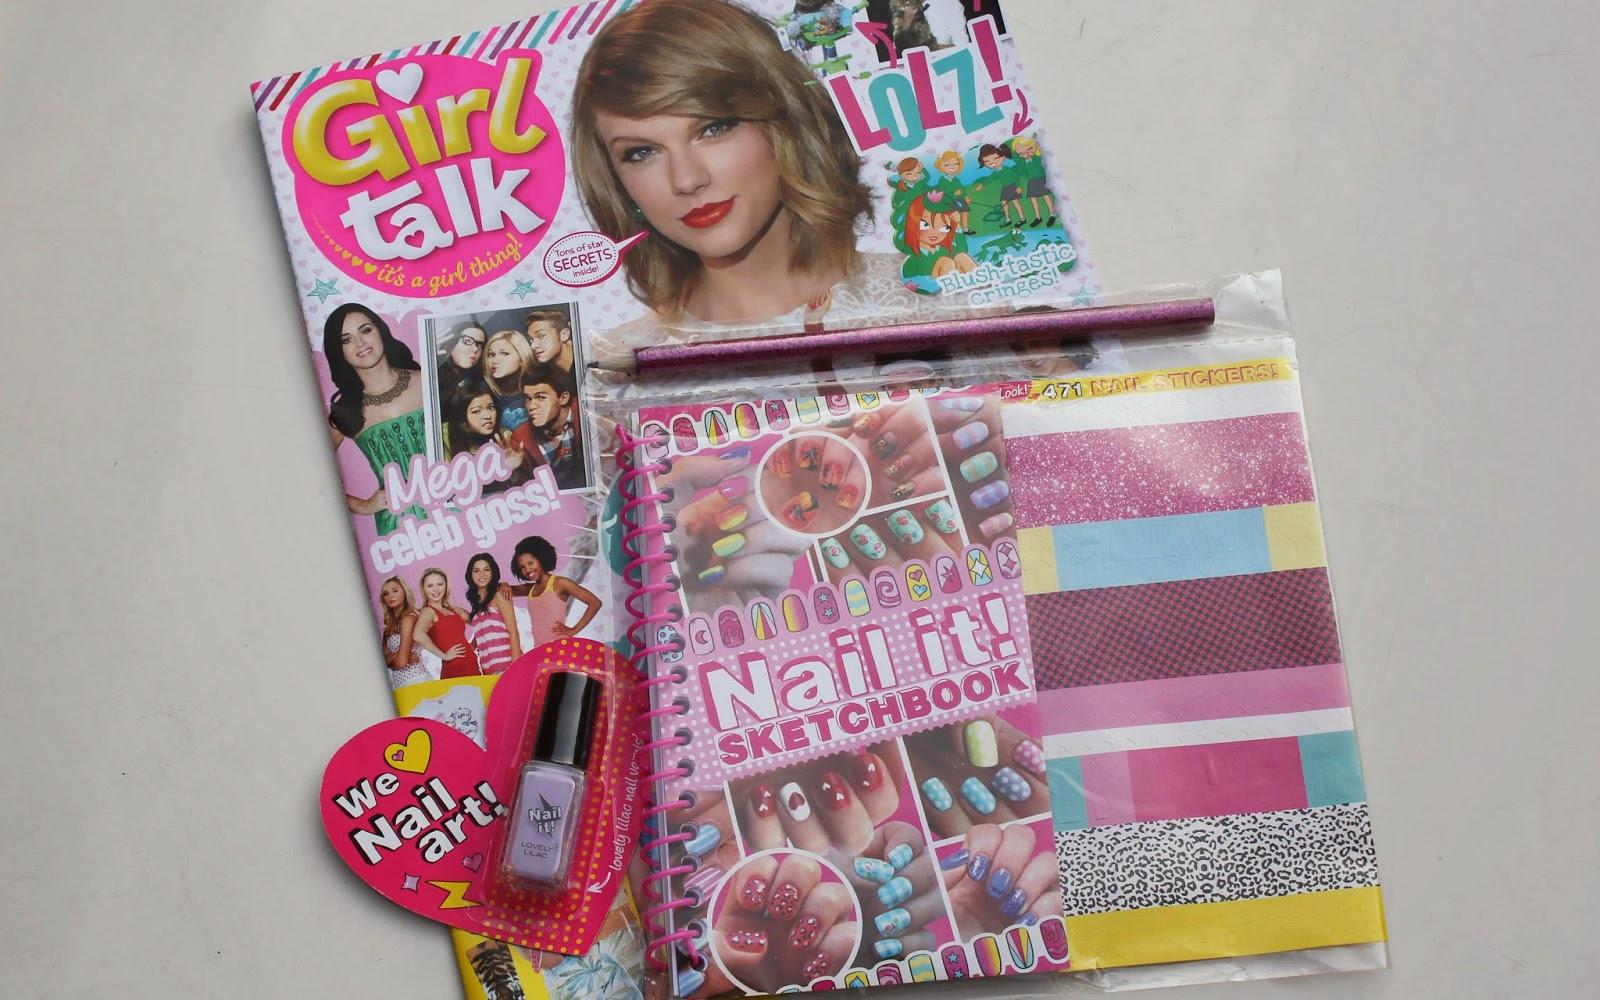 Girl Talk Magazine with Nail Art Kit